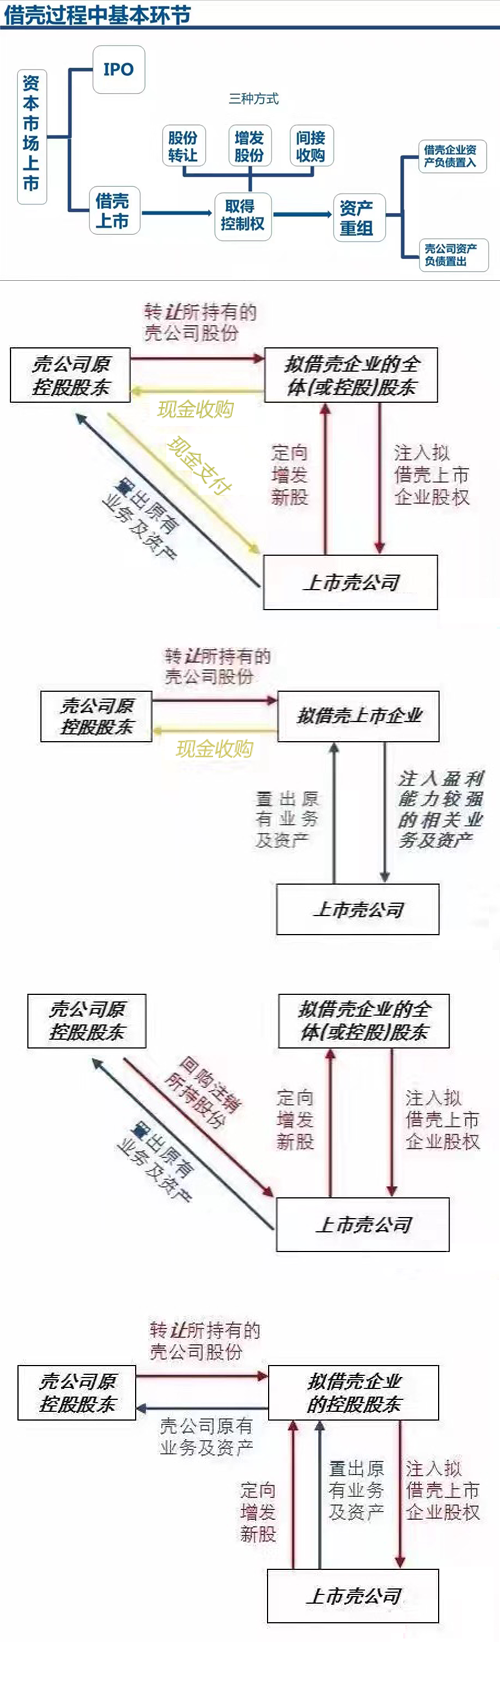 A股2家上市公司控股权转让寻有实力企业收购借壳(欢迎地产企业[项目编号:XM1244]